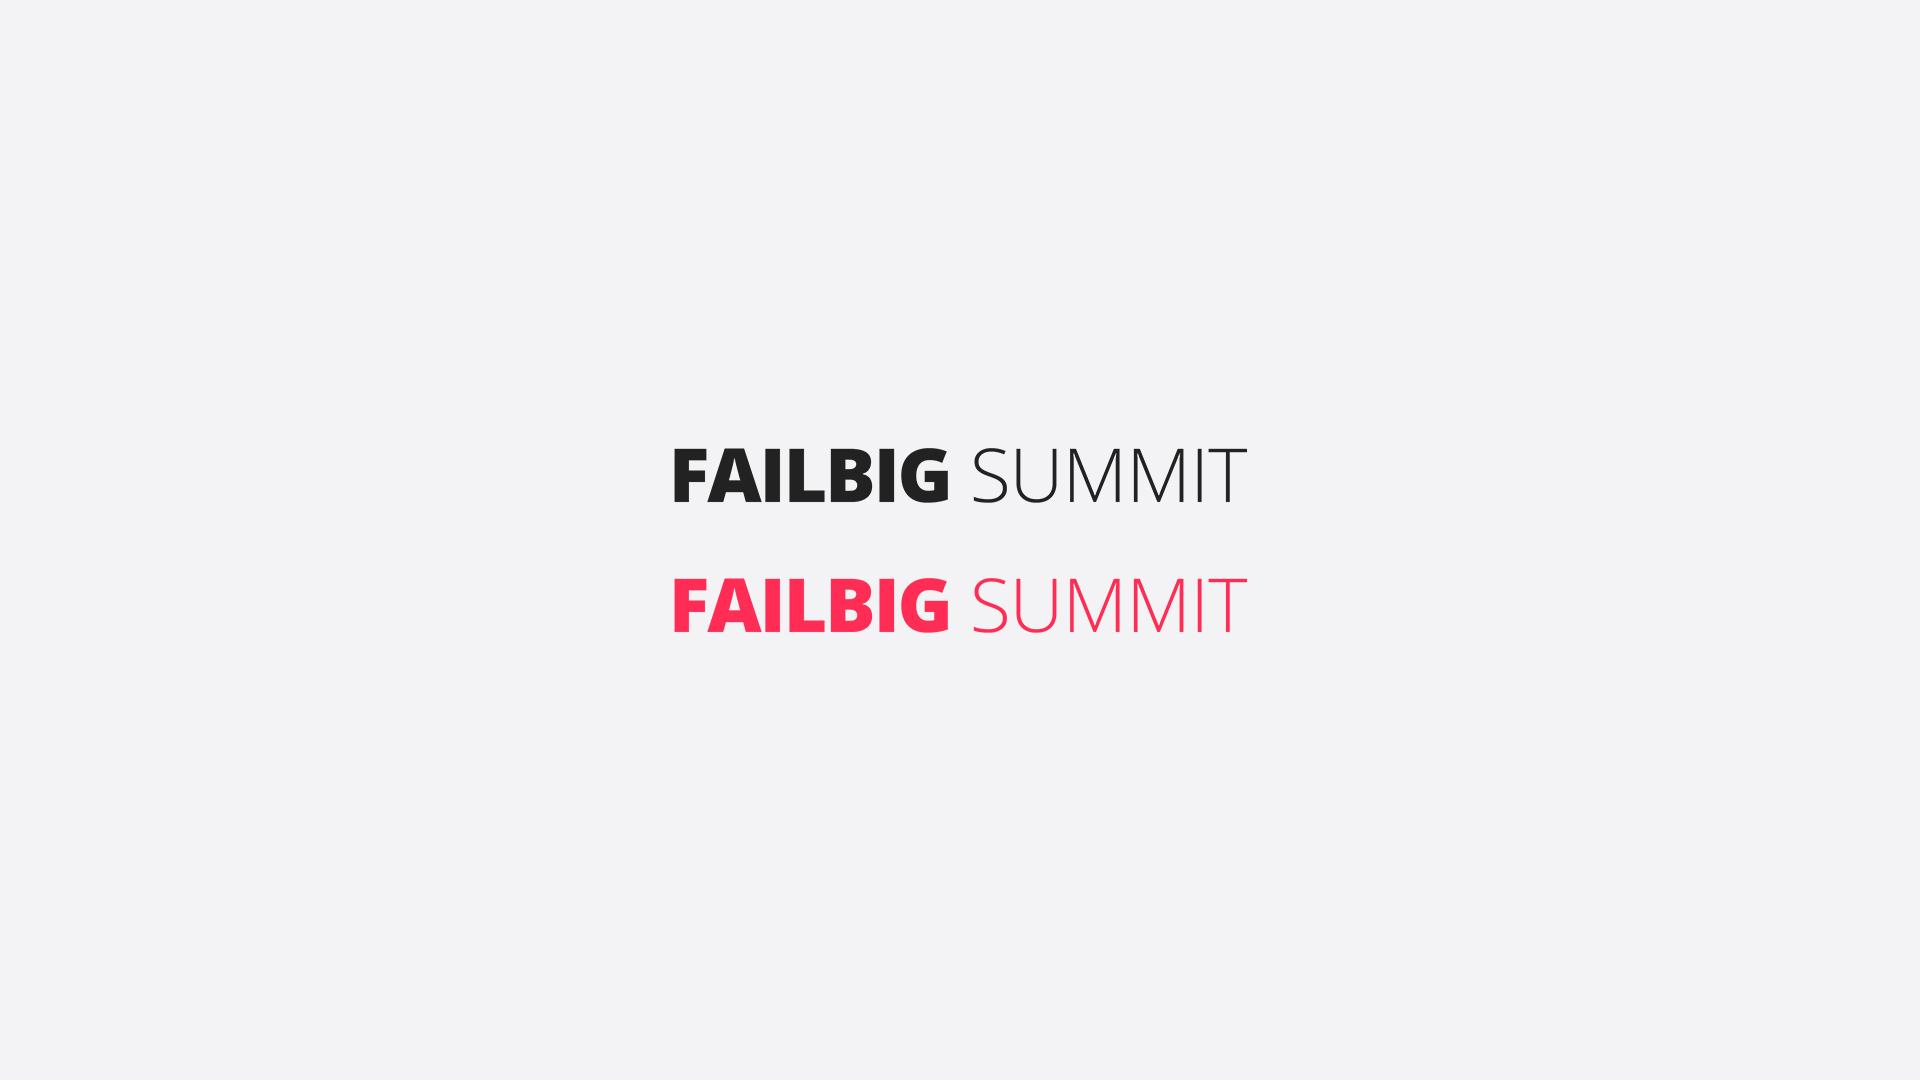 FailBig Summit